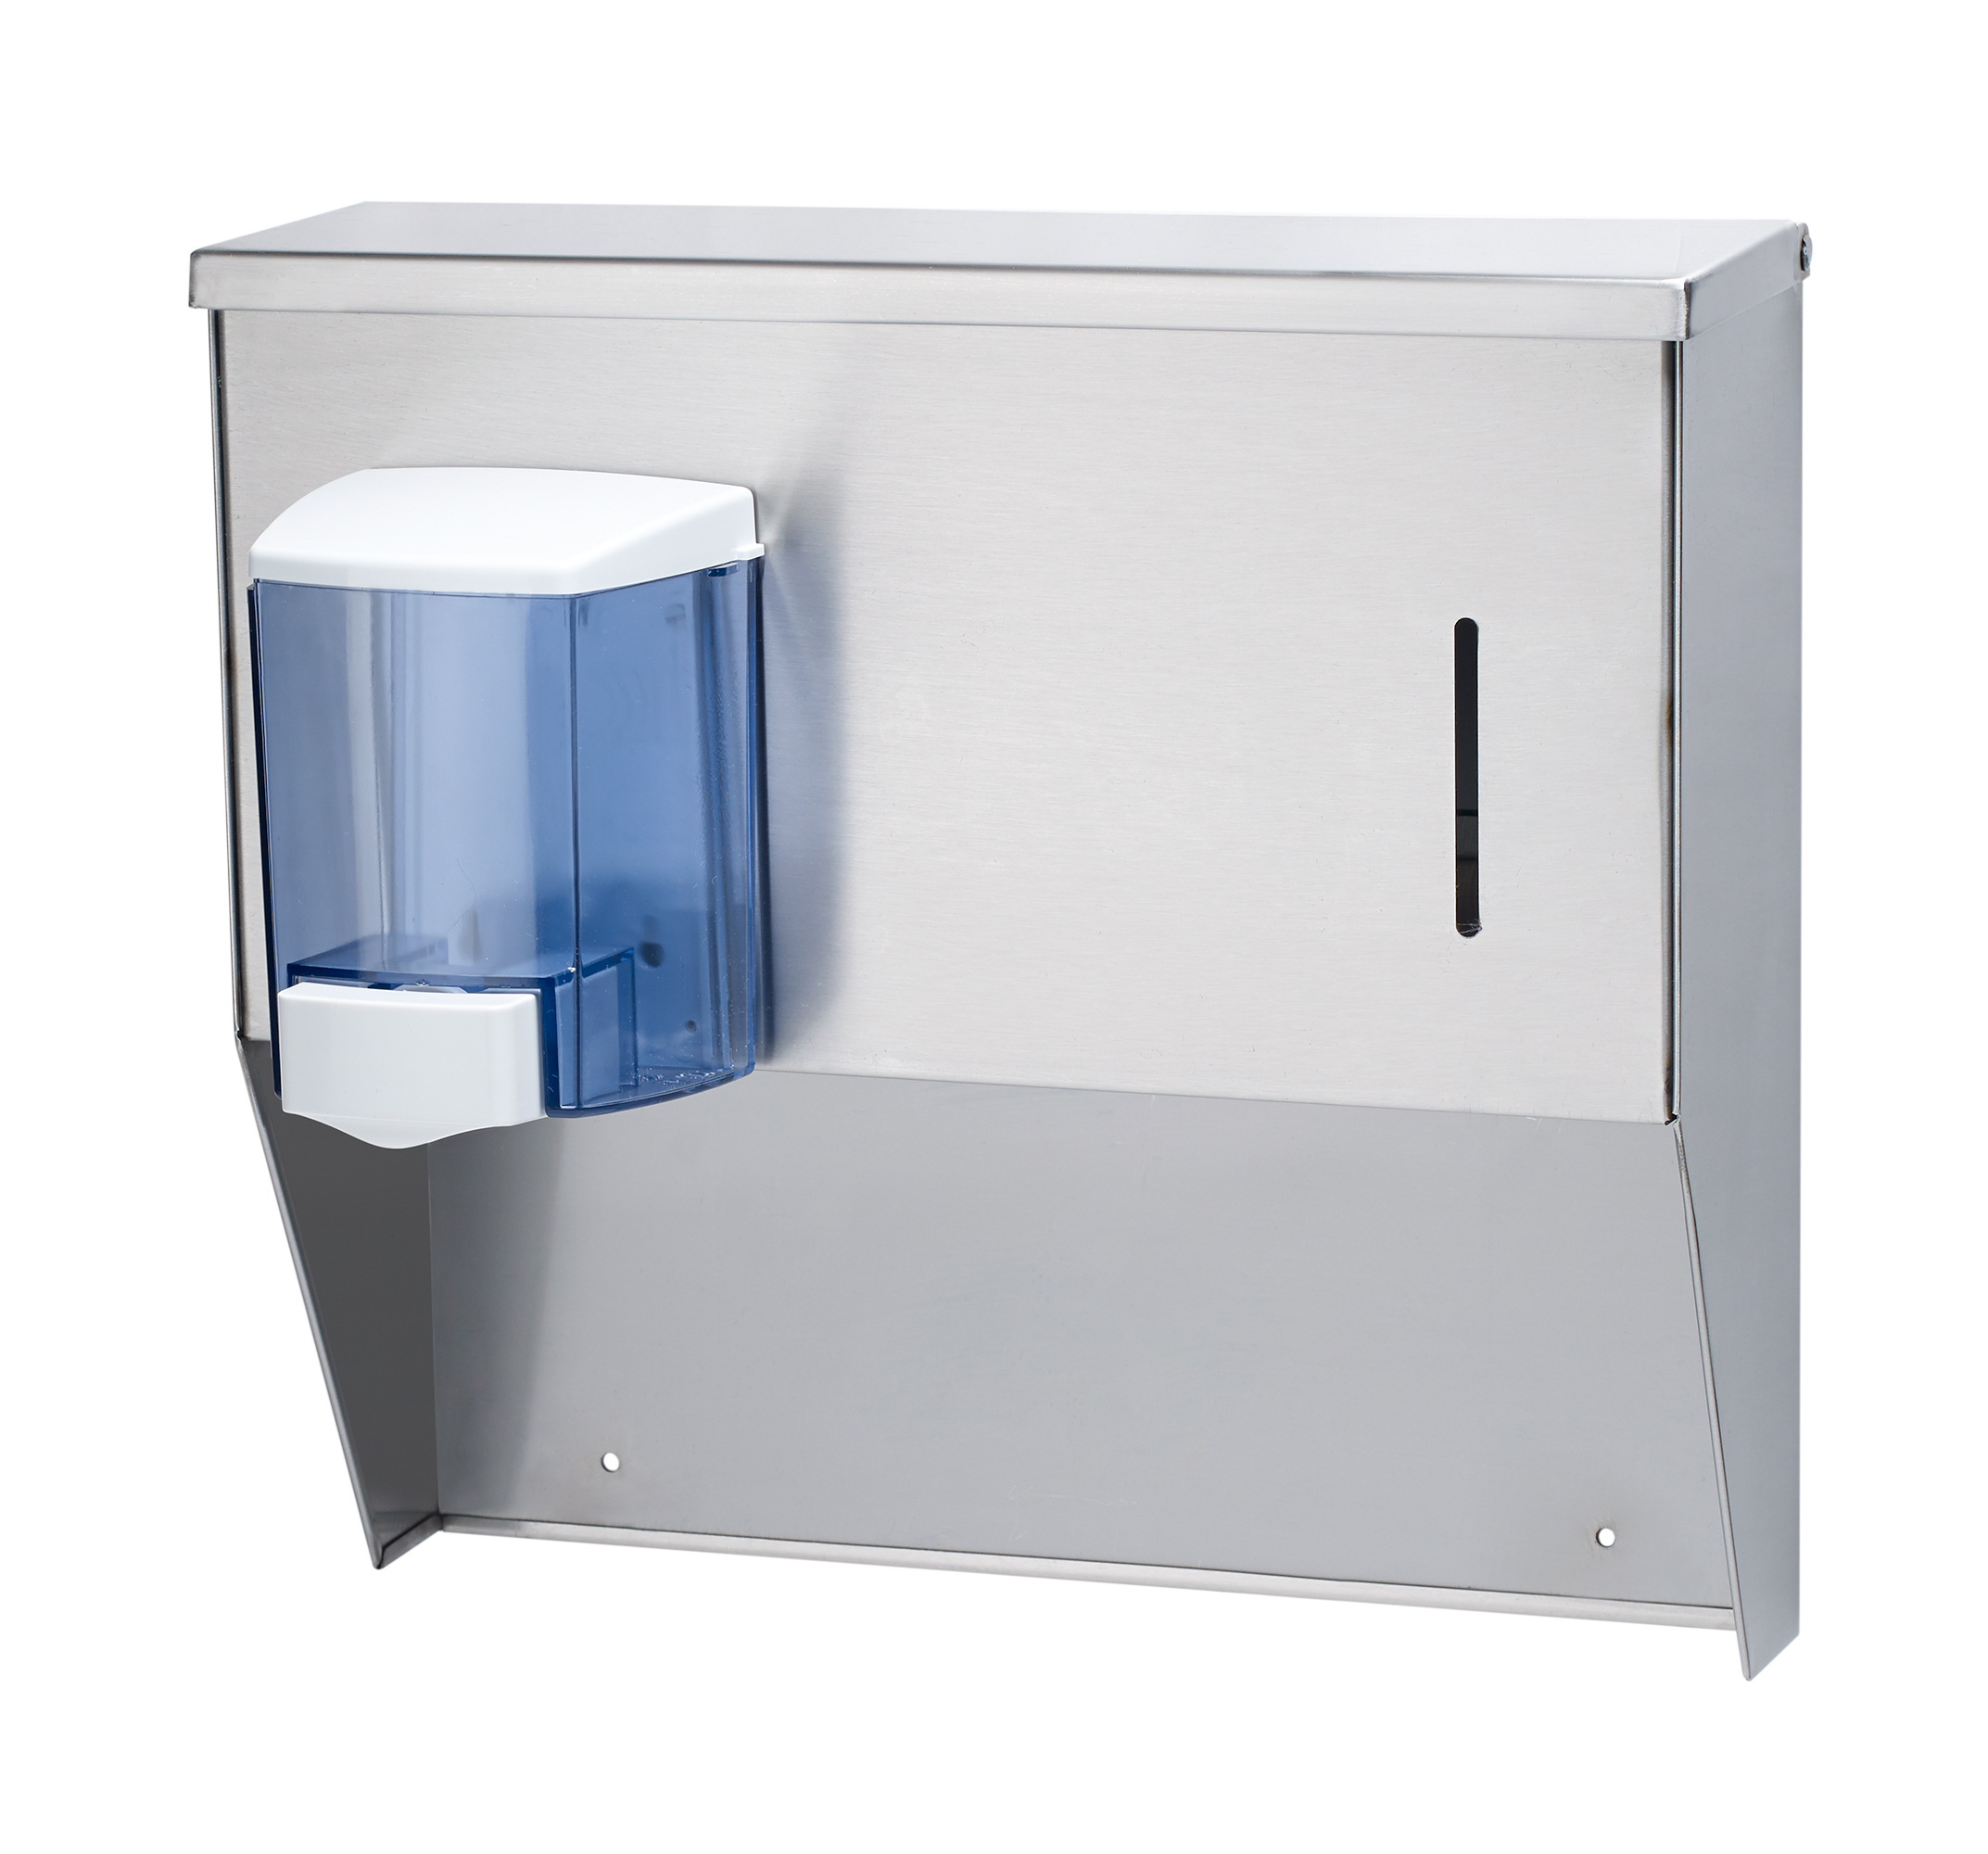 Krowne Metal H-111 wall mount dispenser